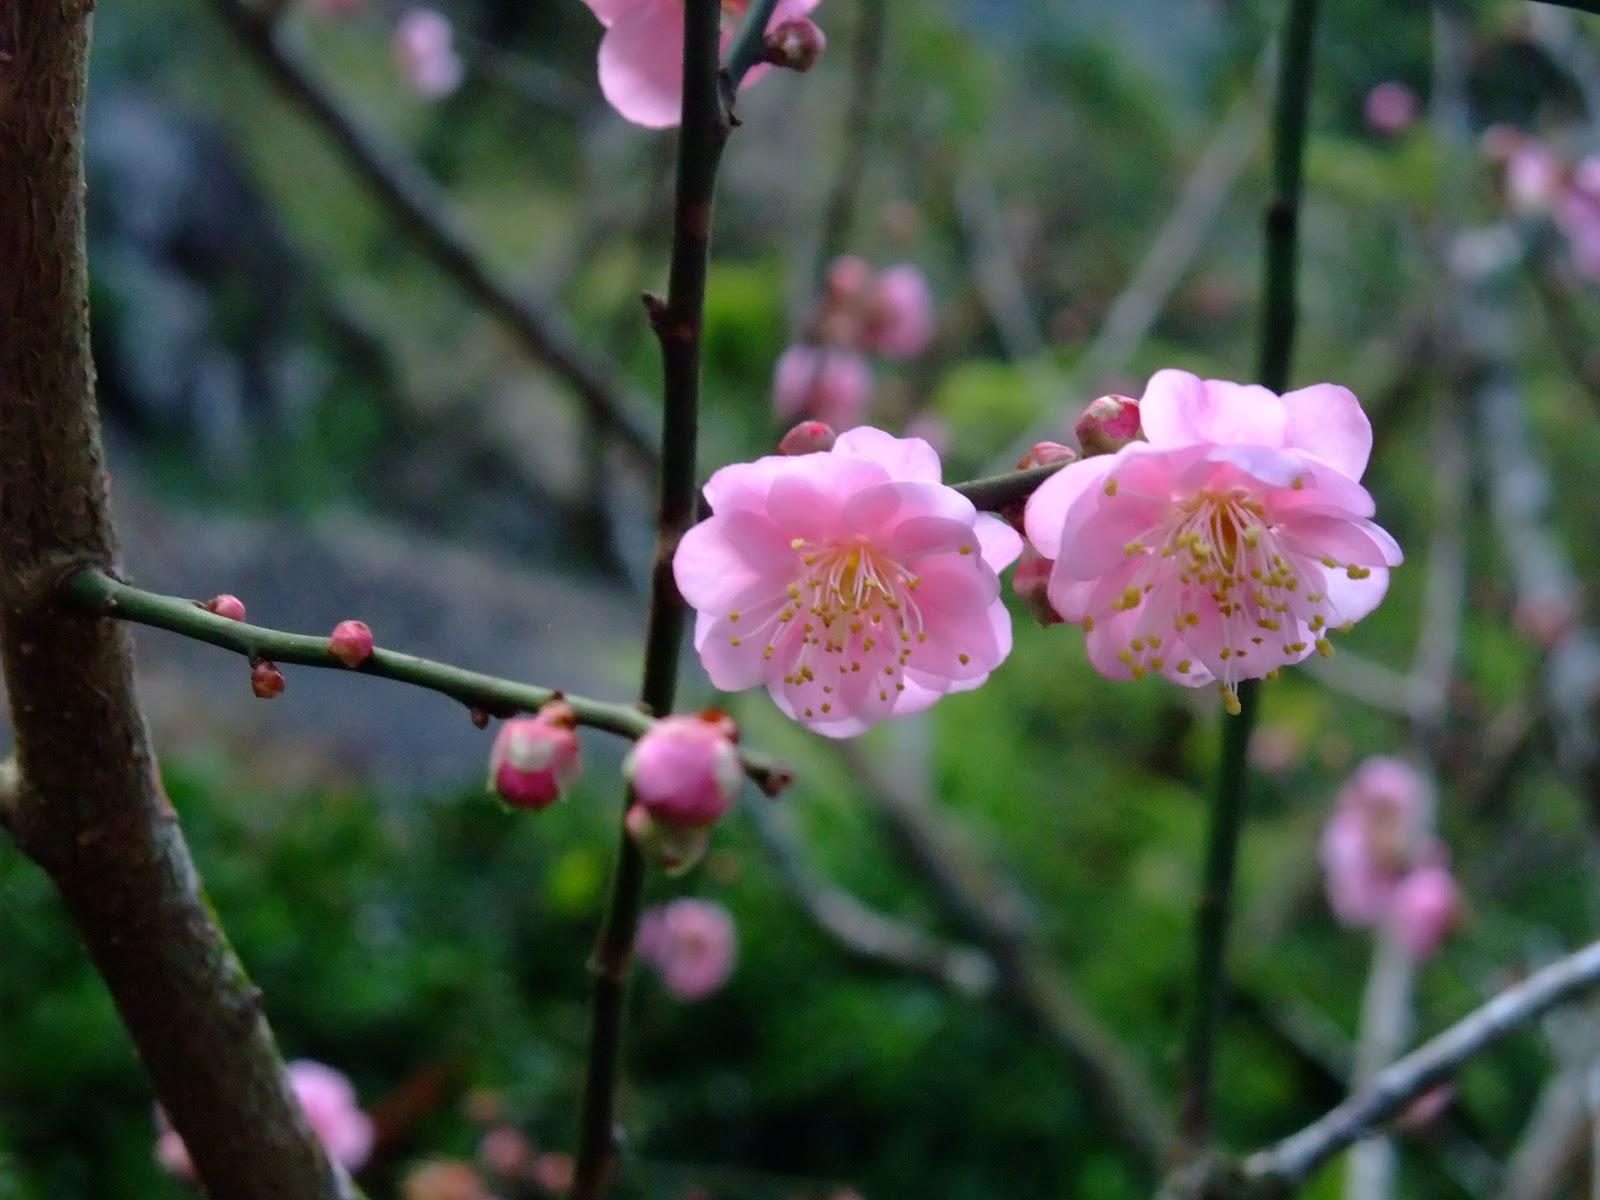 春暖花開: 紅梅 Plum Blossoms 春暖花開   紅梅 Plum Blossoms